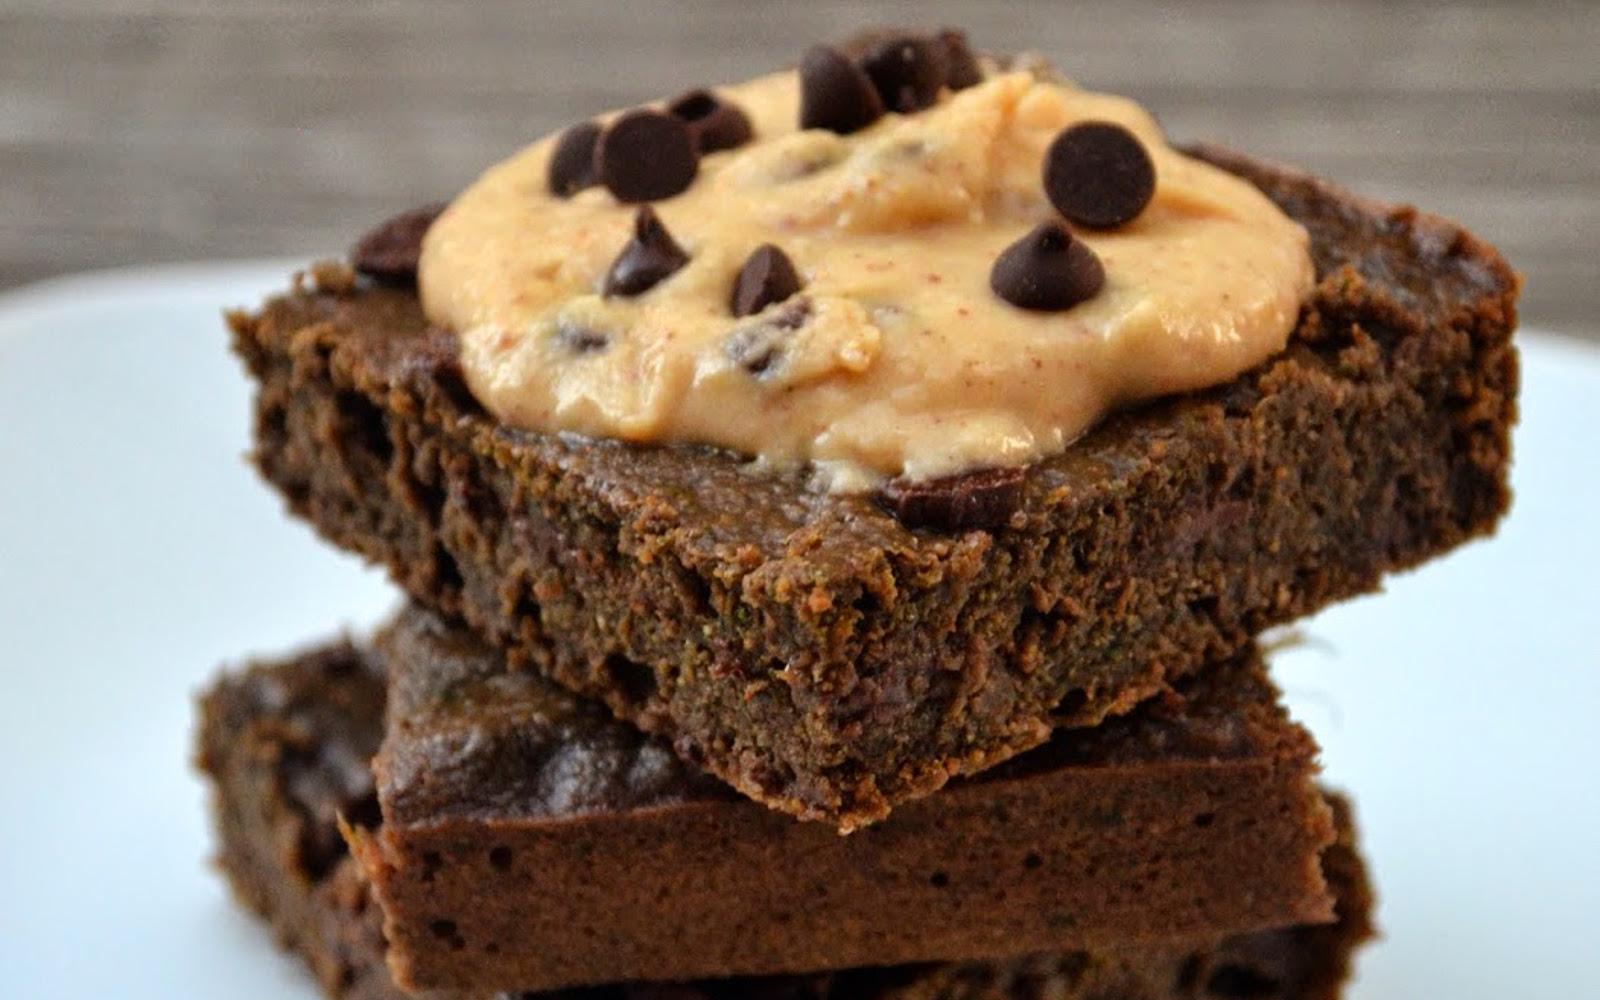 Vegan Kale Brownies and Chocolate Chip Cookie Spread